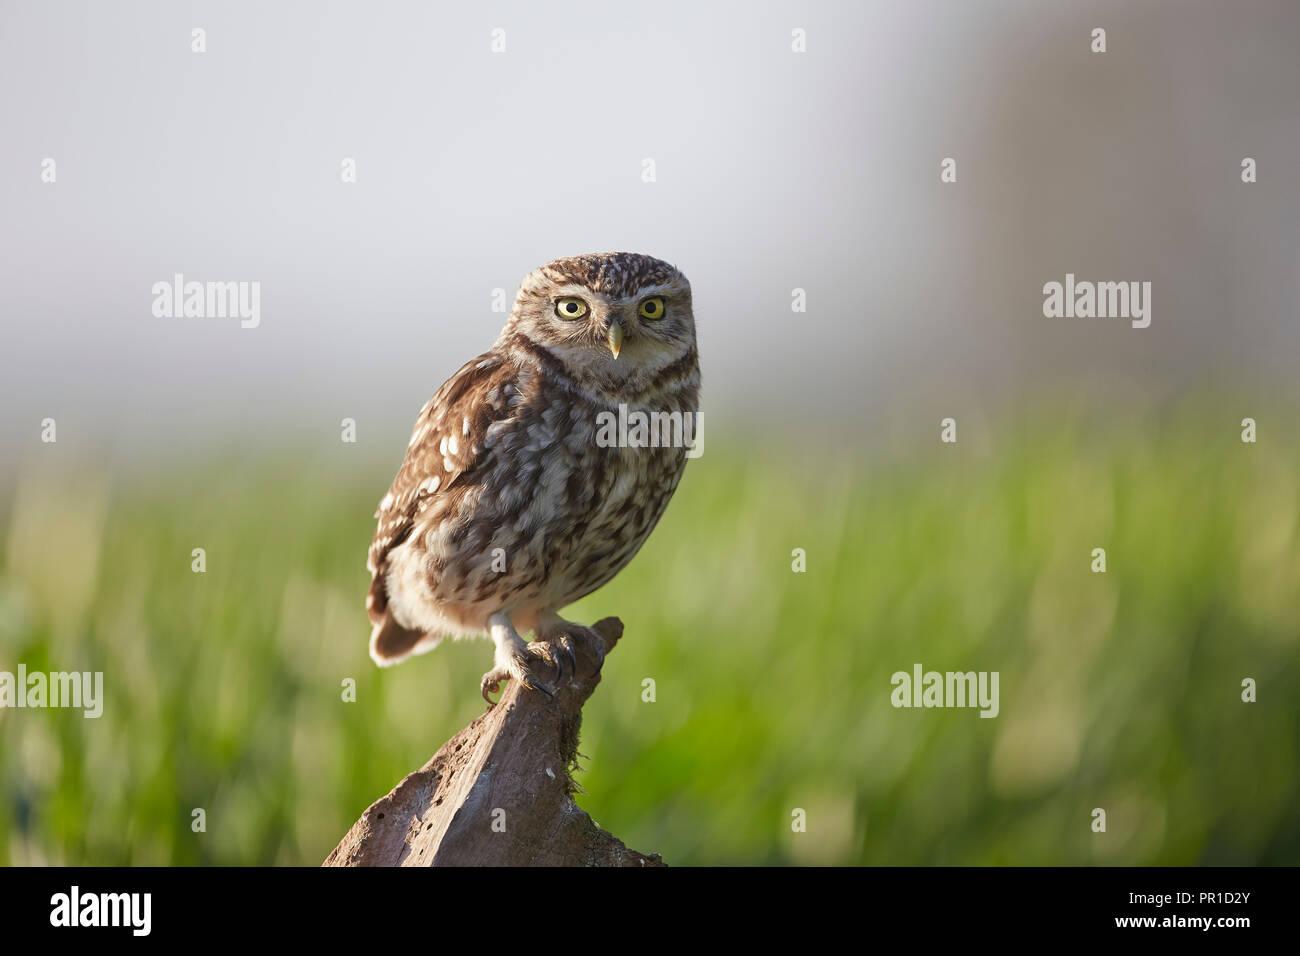 Steinkauz, Athene noctua am Les Gibbon kleine Eule Fotografie fotografiert verbergen, East Yorkshire. Stockbild